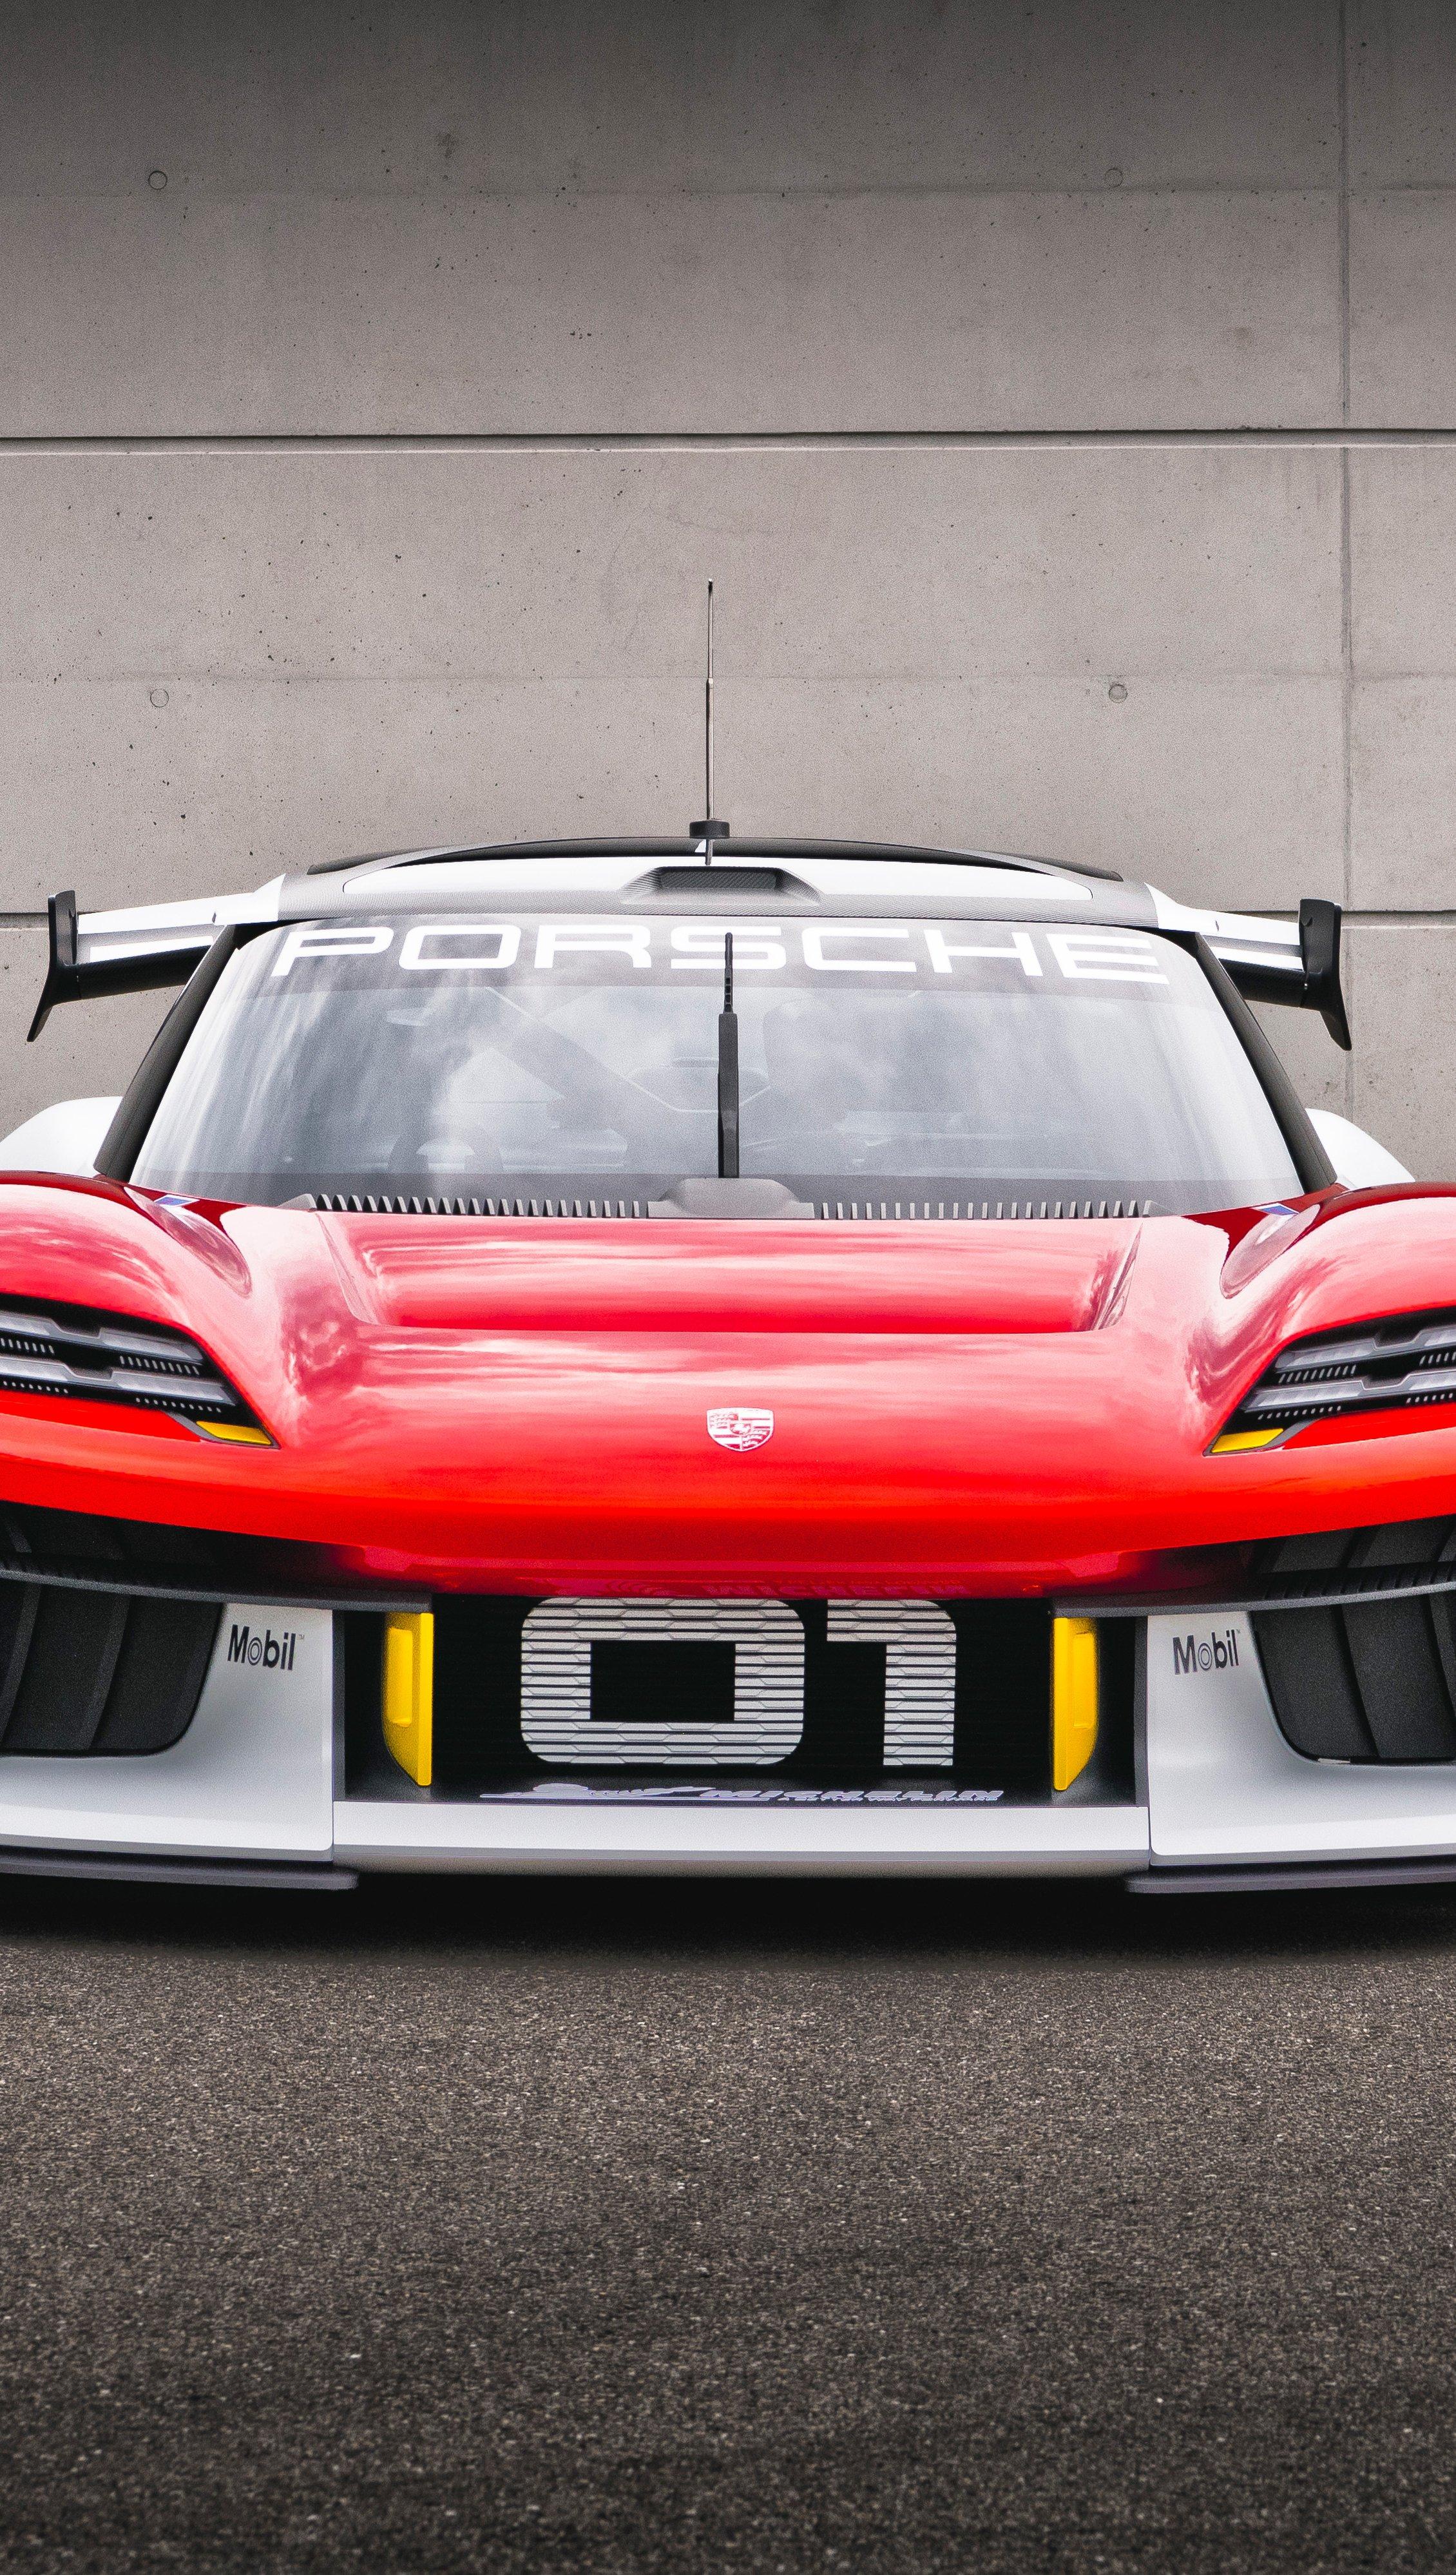 Fondos de pantalla Porsche Mission R Vertical